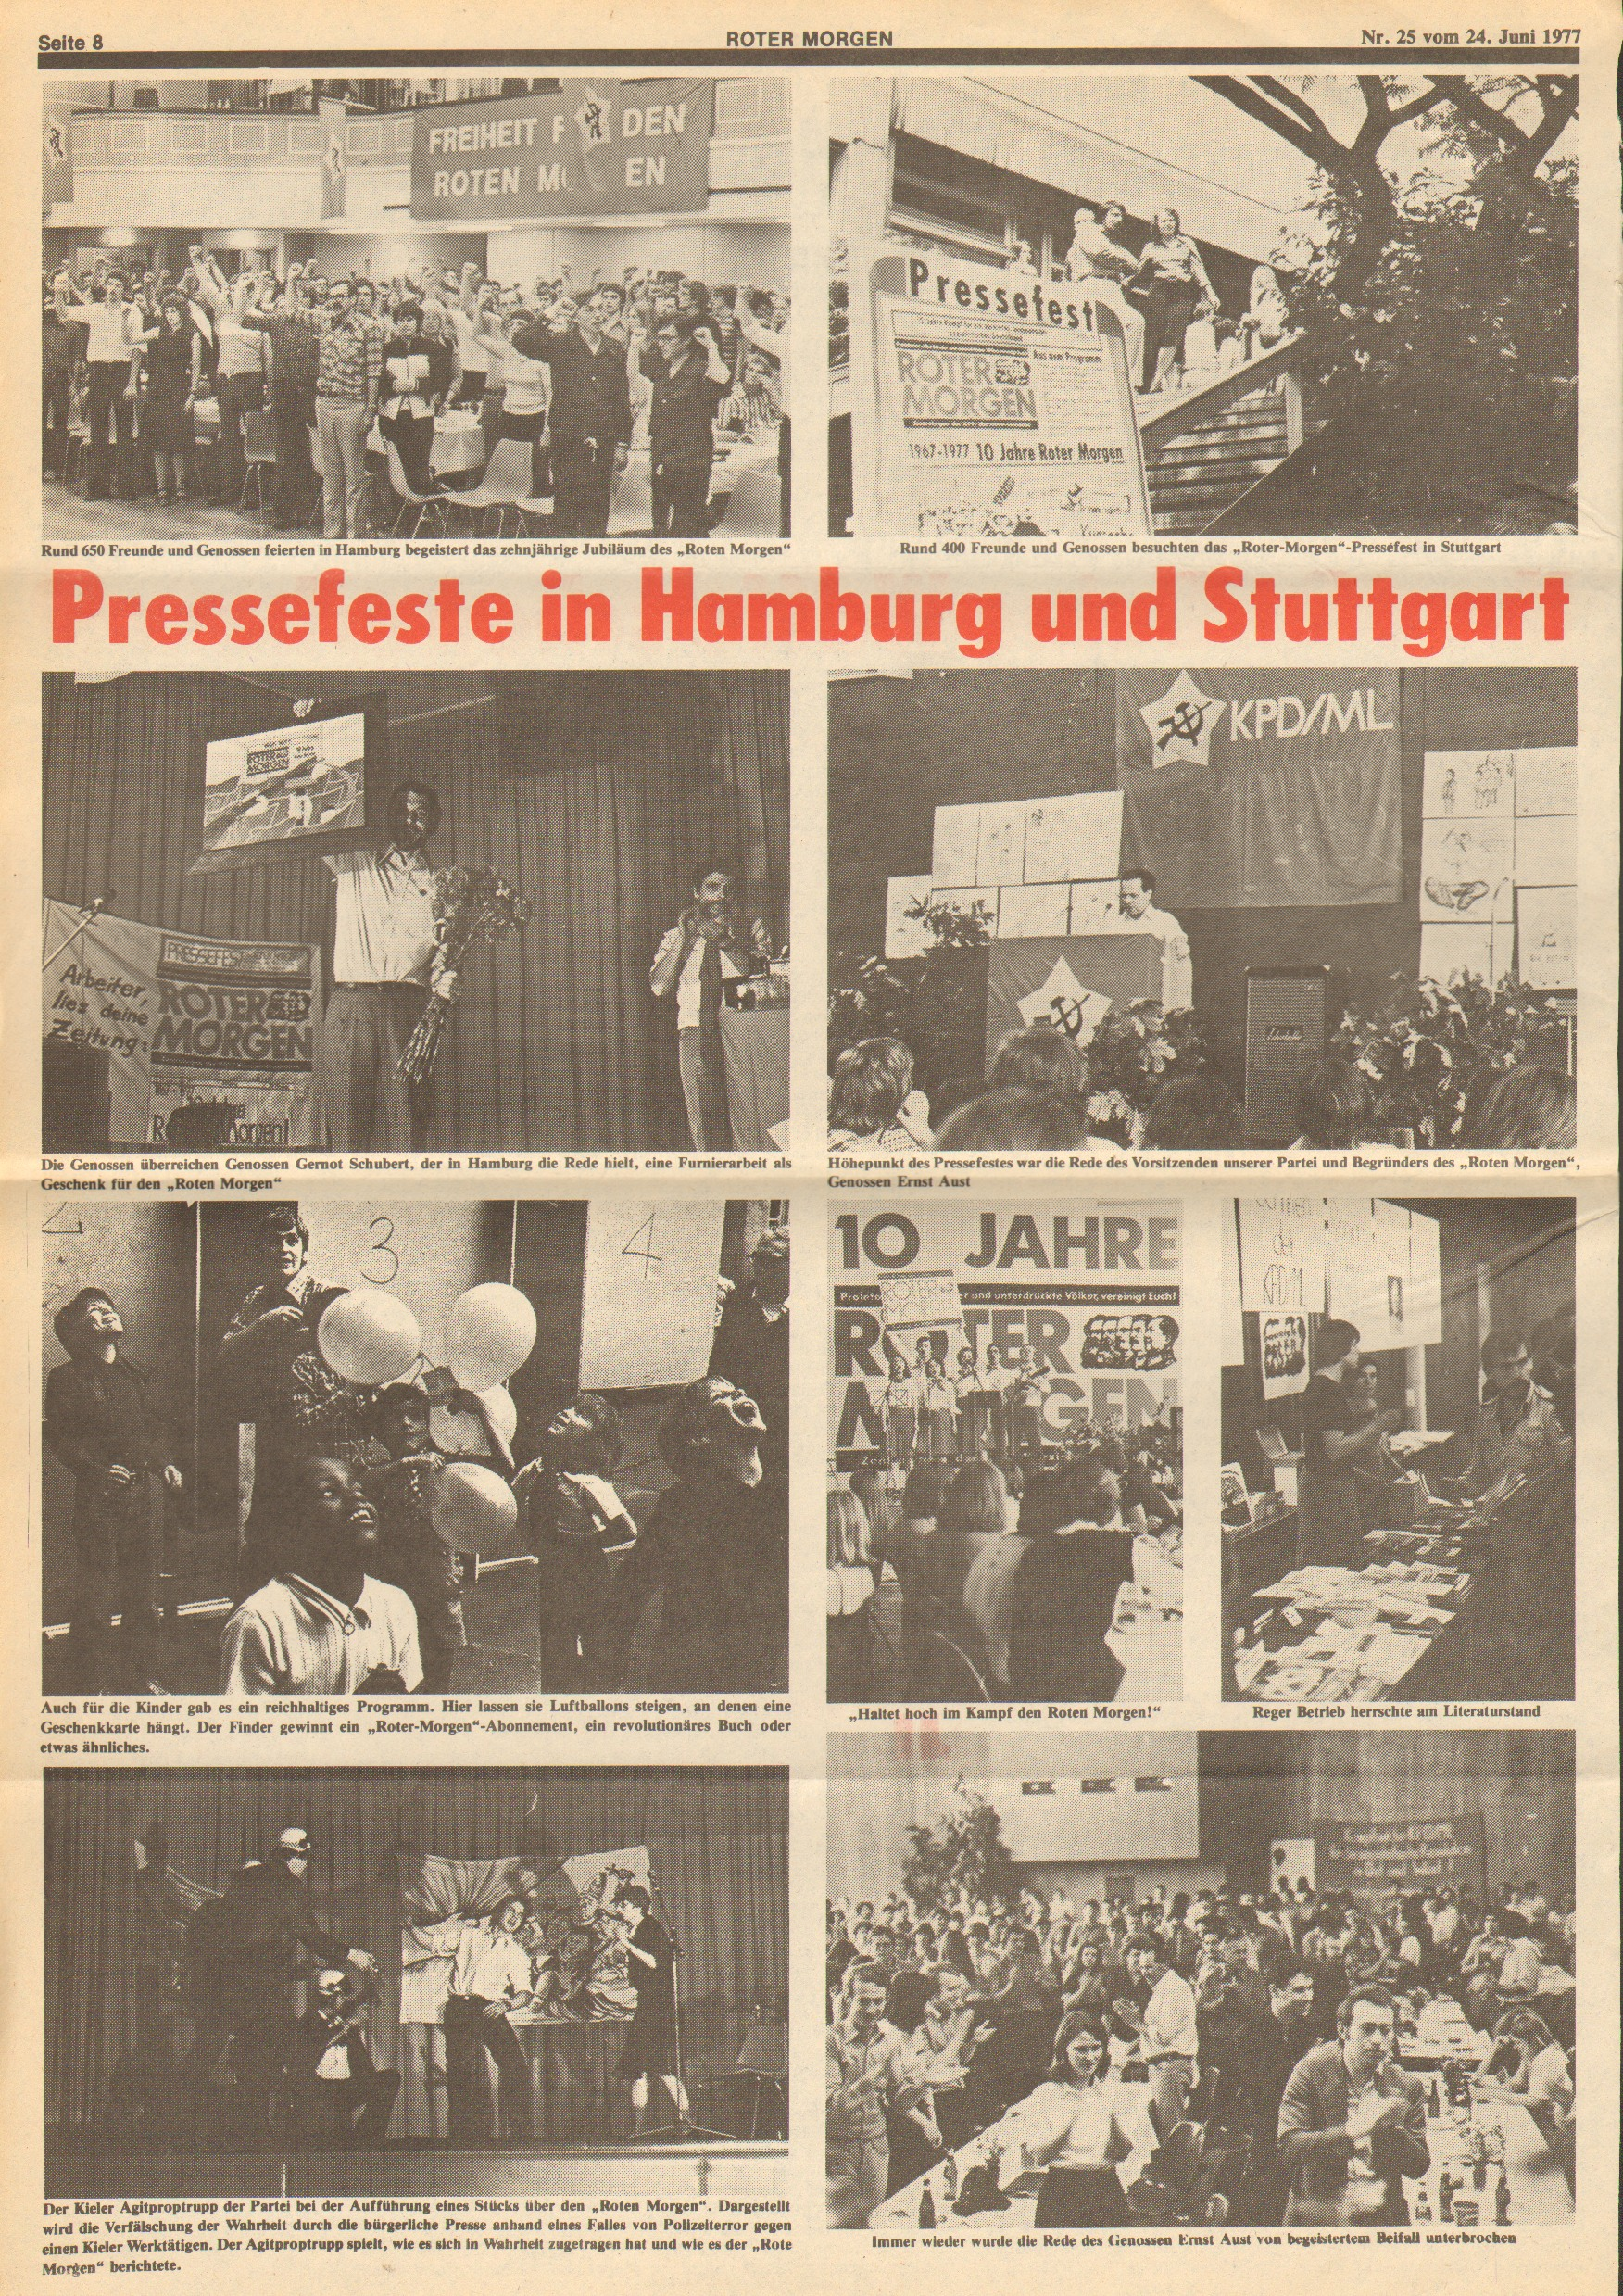 Roter Morgen, 11. Jg., 24. Juni 1977, Nr. 25, Seite 8